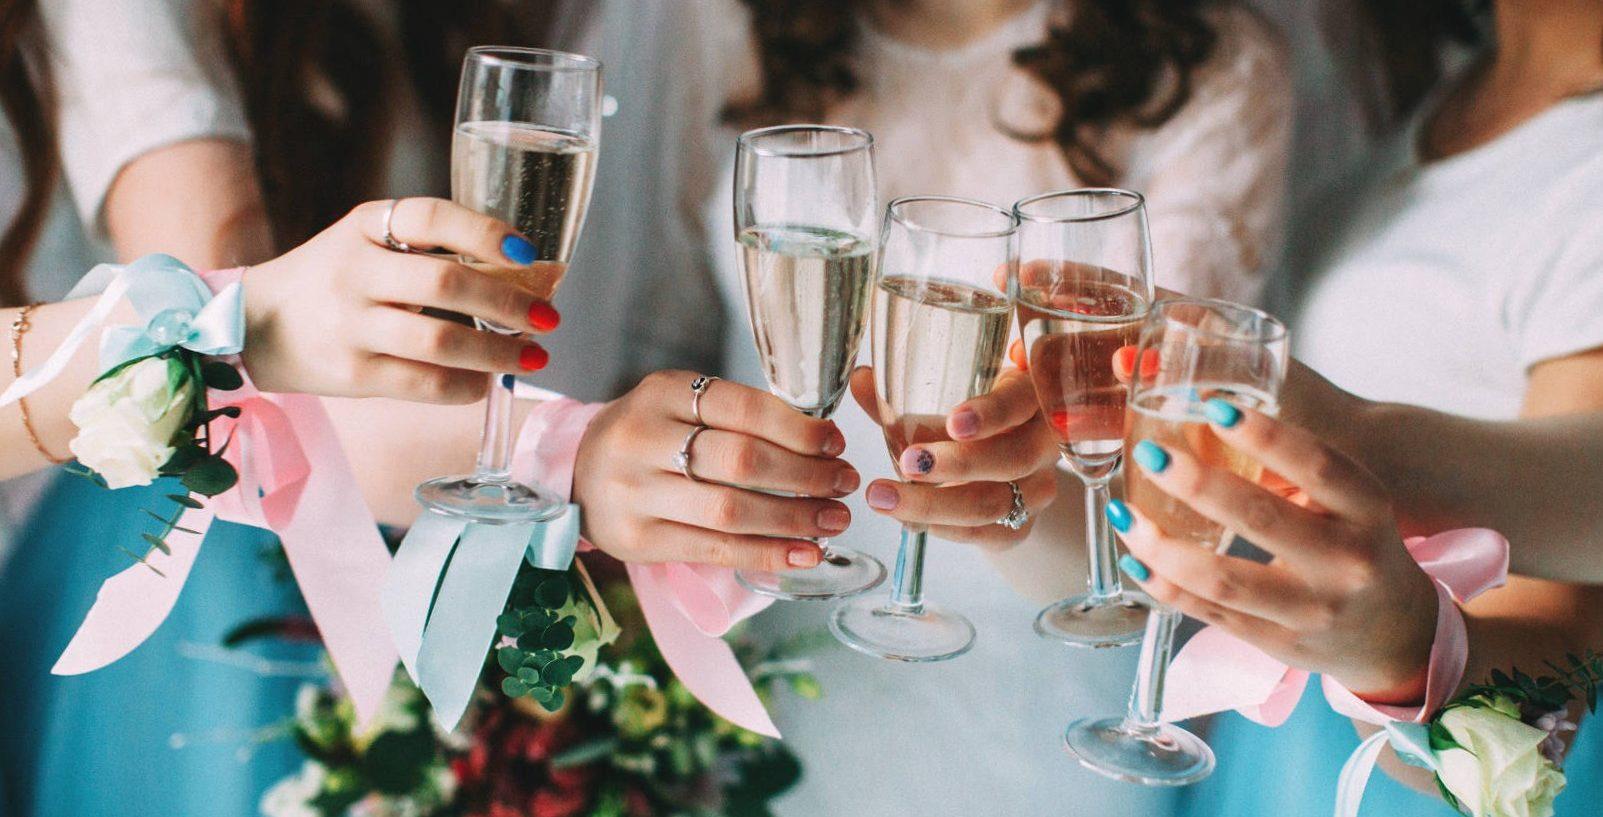 Подарок на девичник невесте